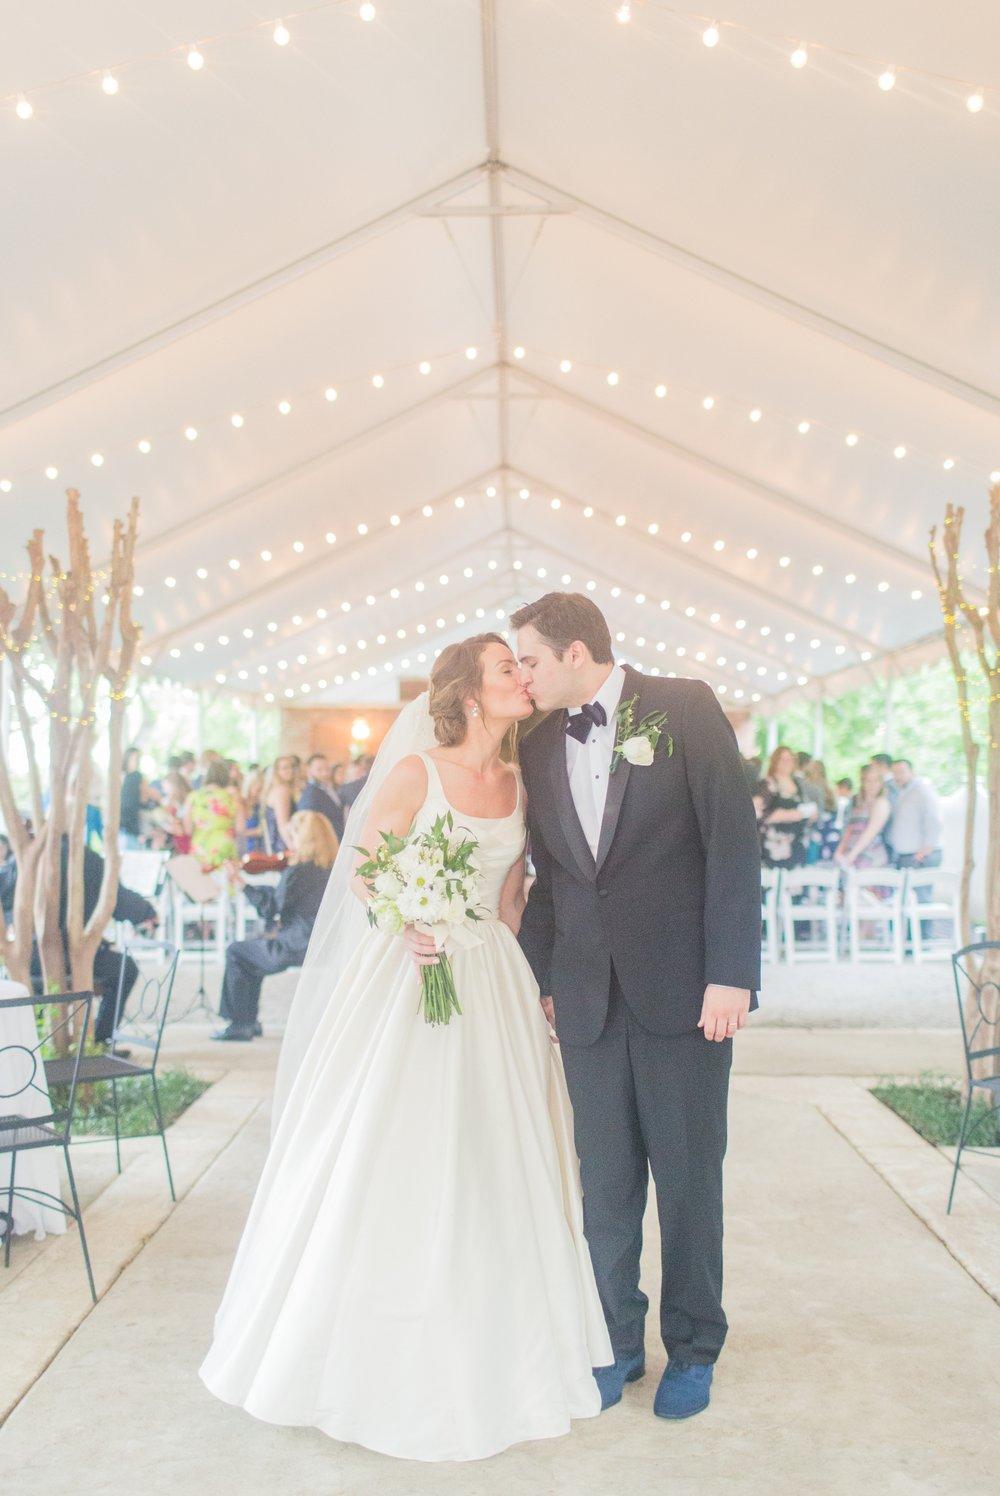 memphis-wedding-hunt-phelan 45.jpg